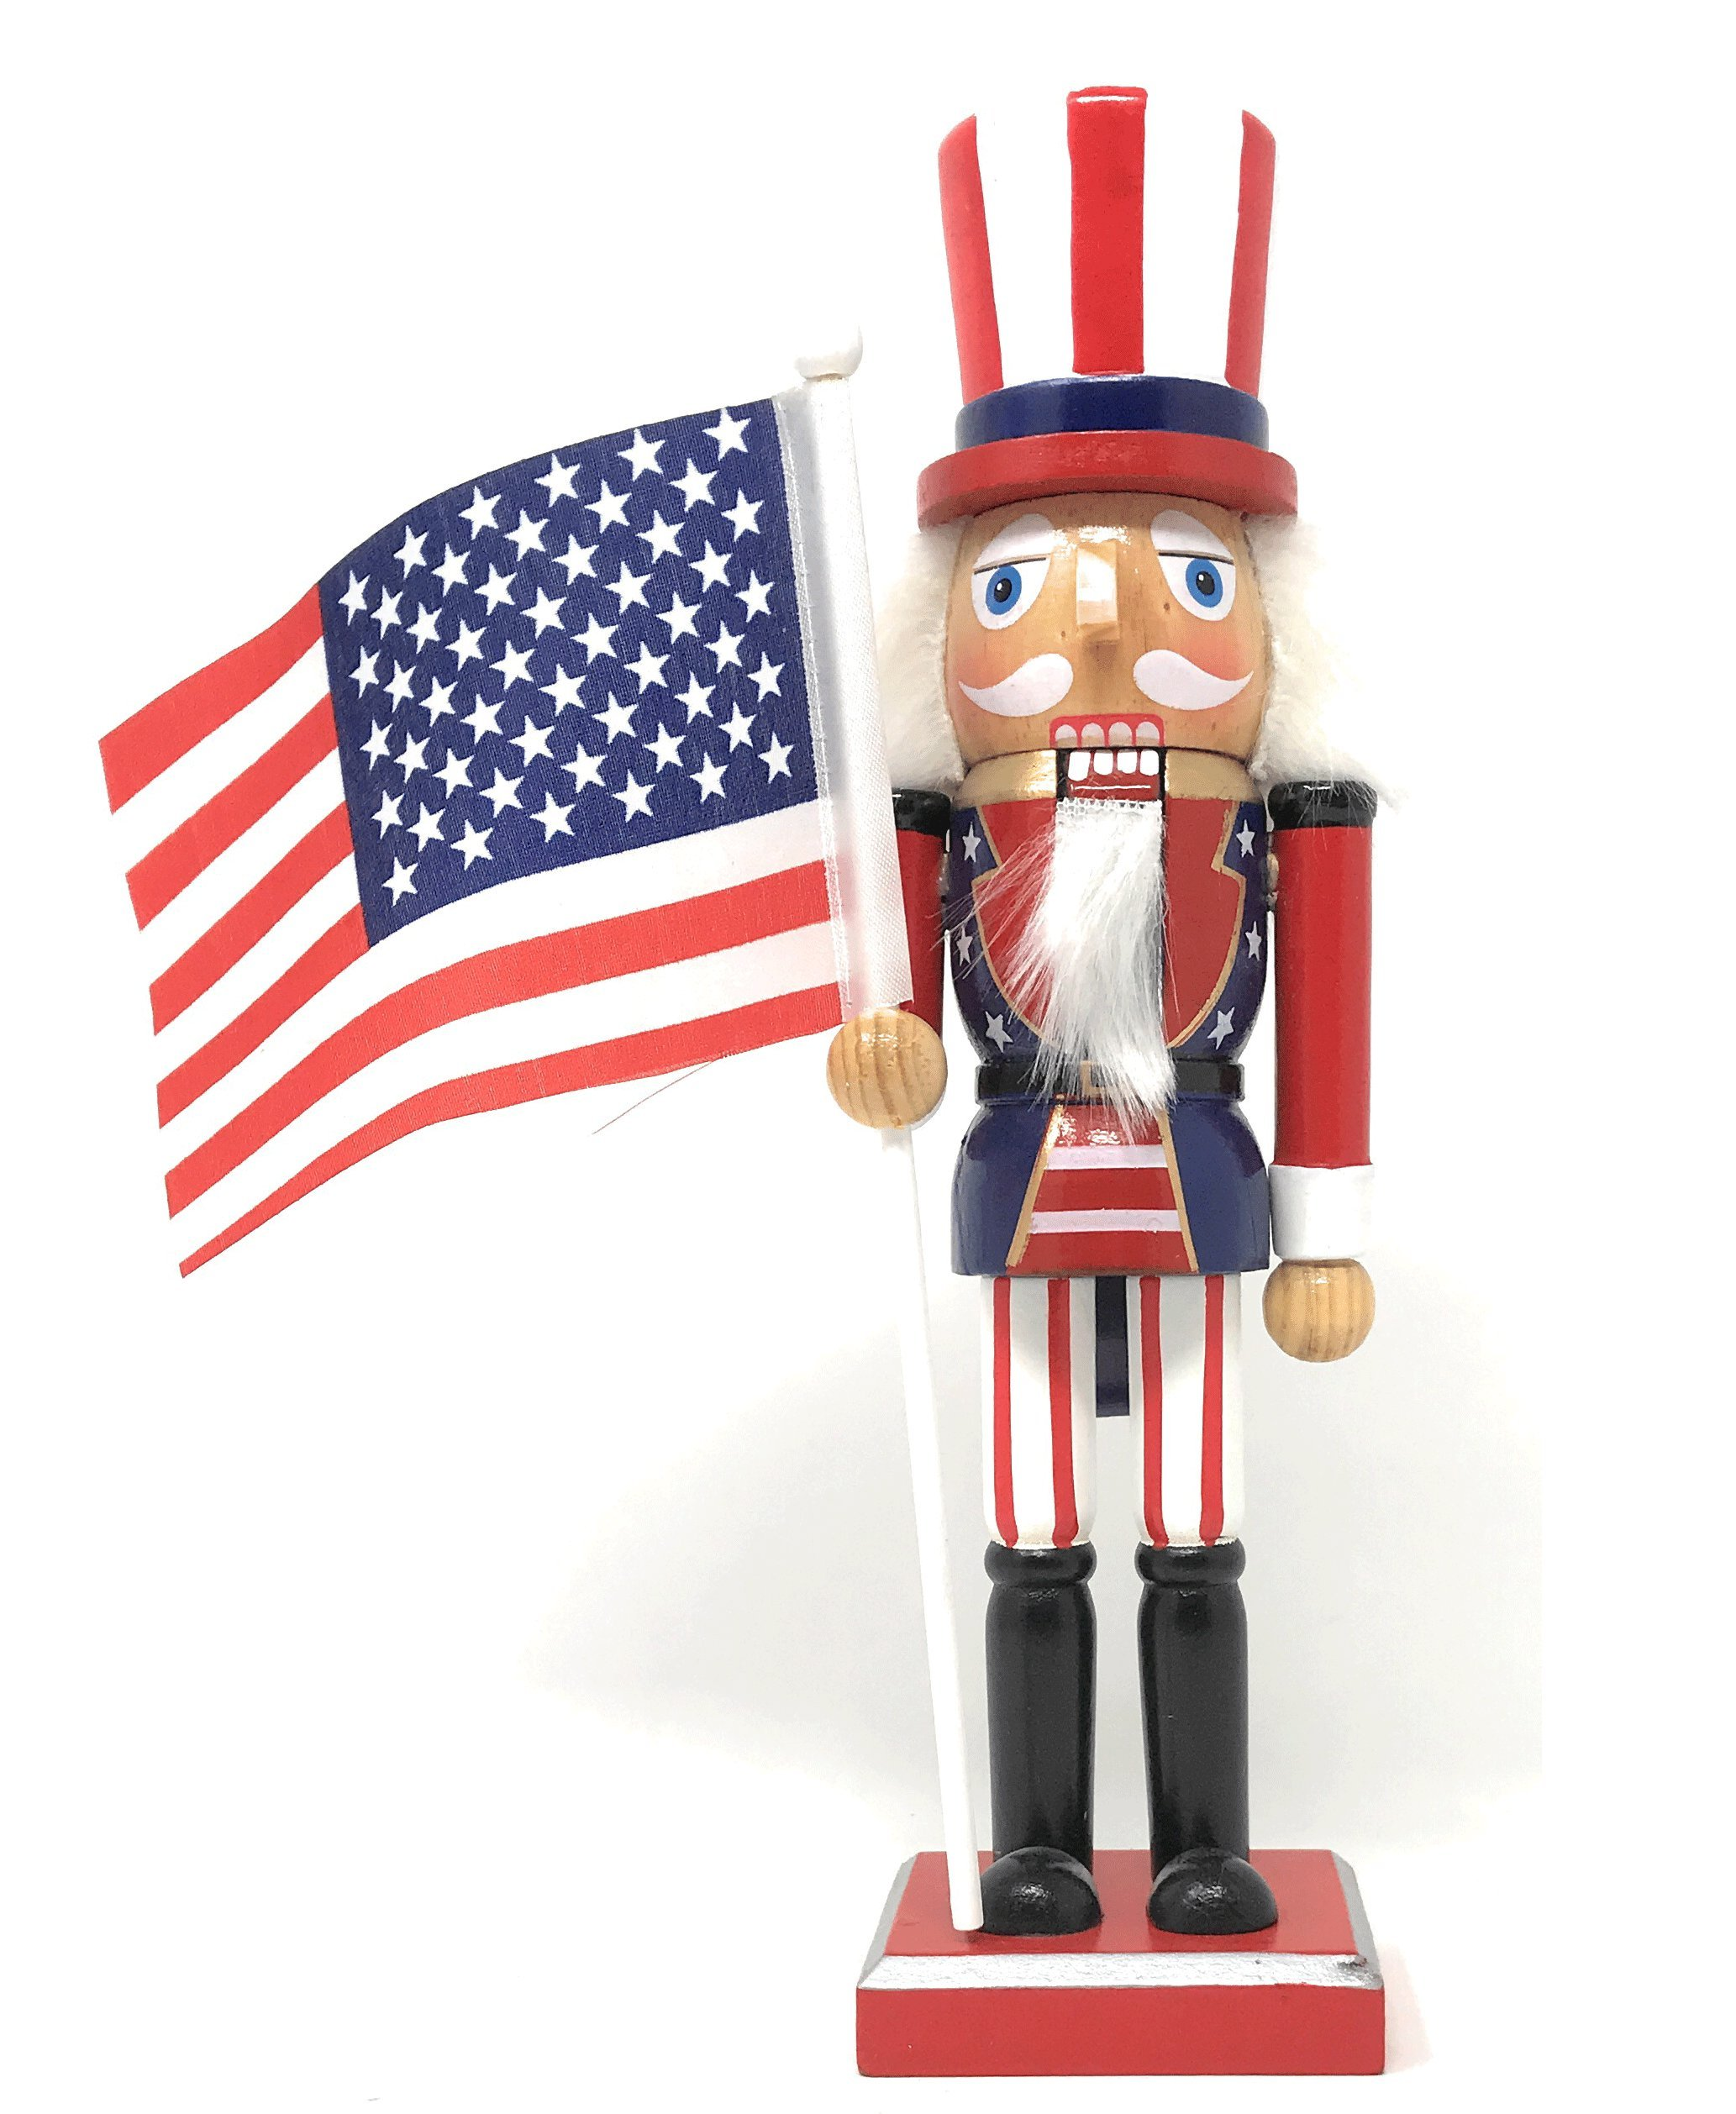 Nantucket Home Wooden Christmas Nutcracker Decor, 10-Inch (Uncle Sam Americana)